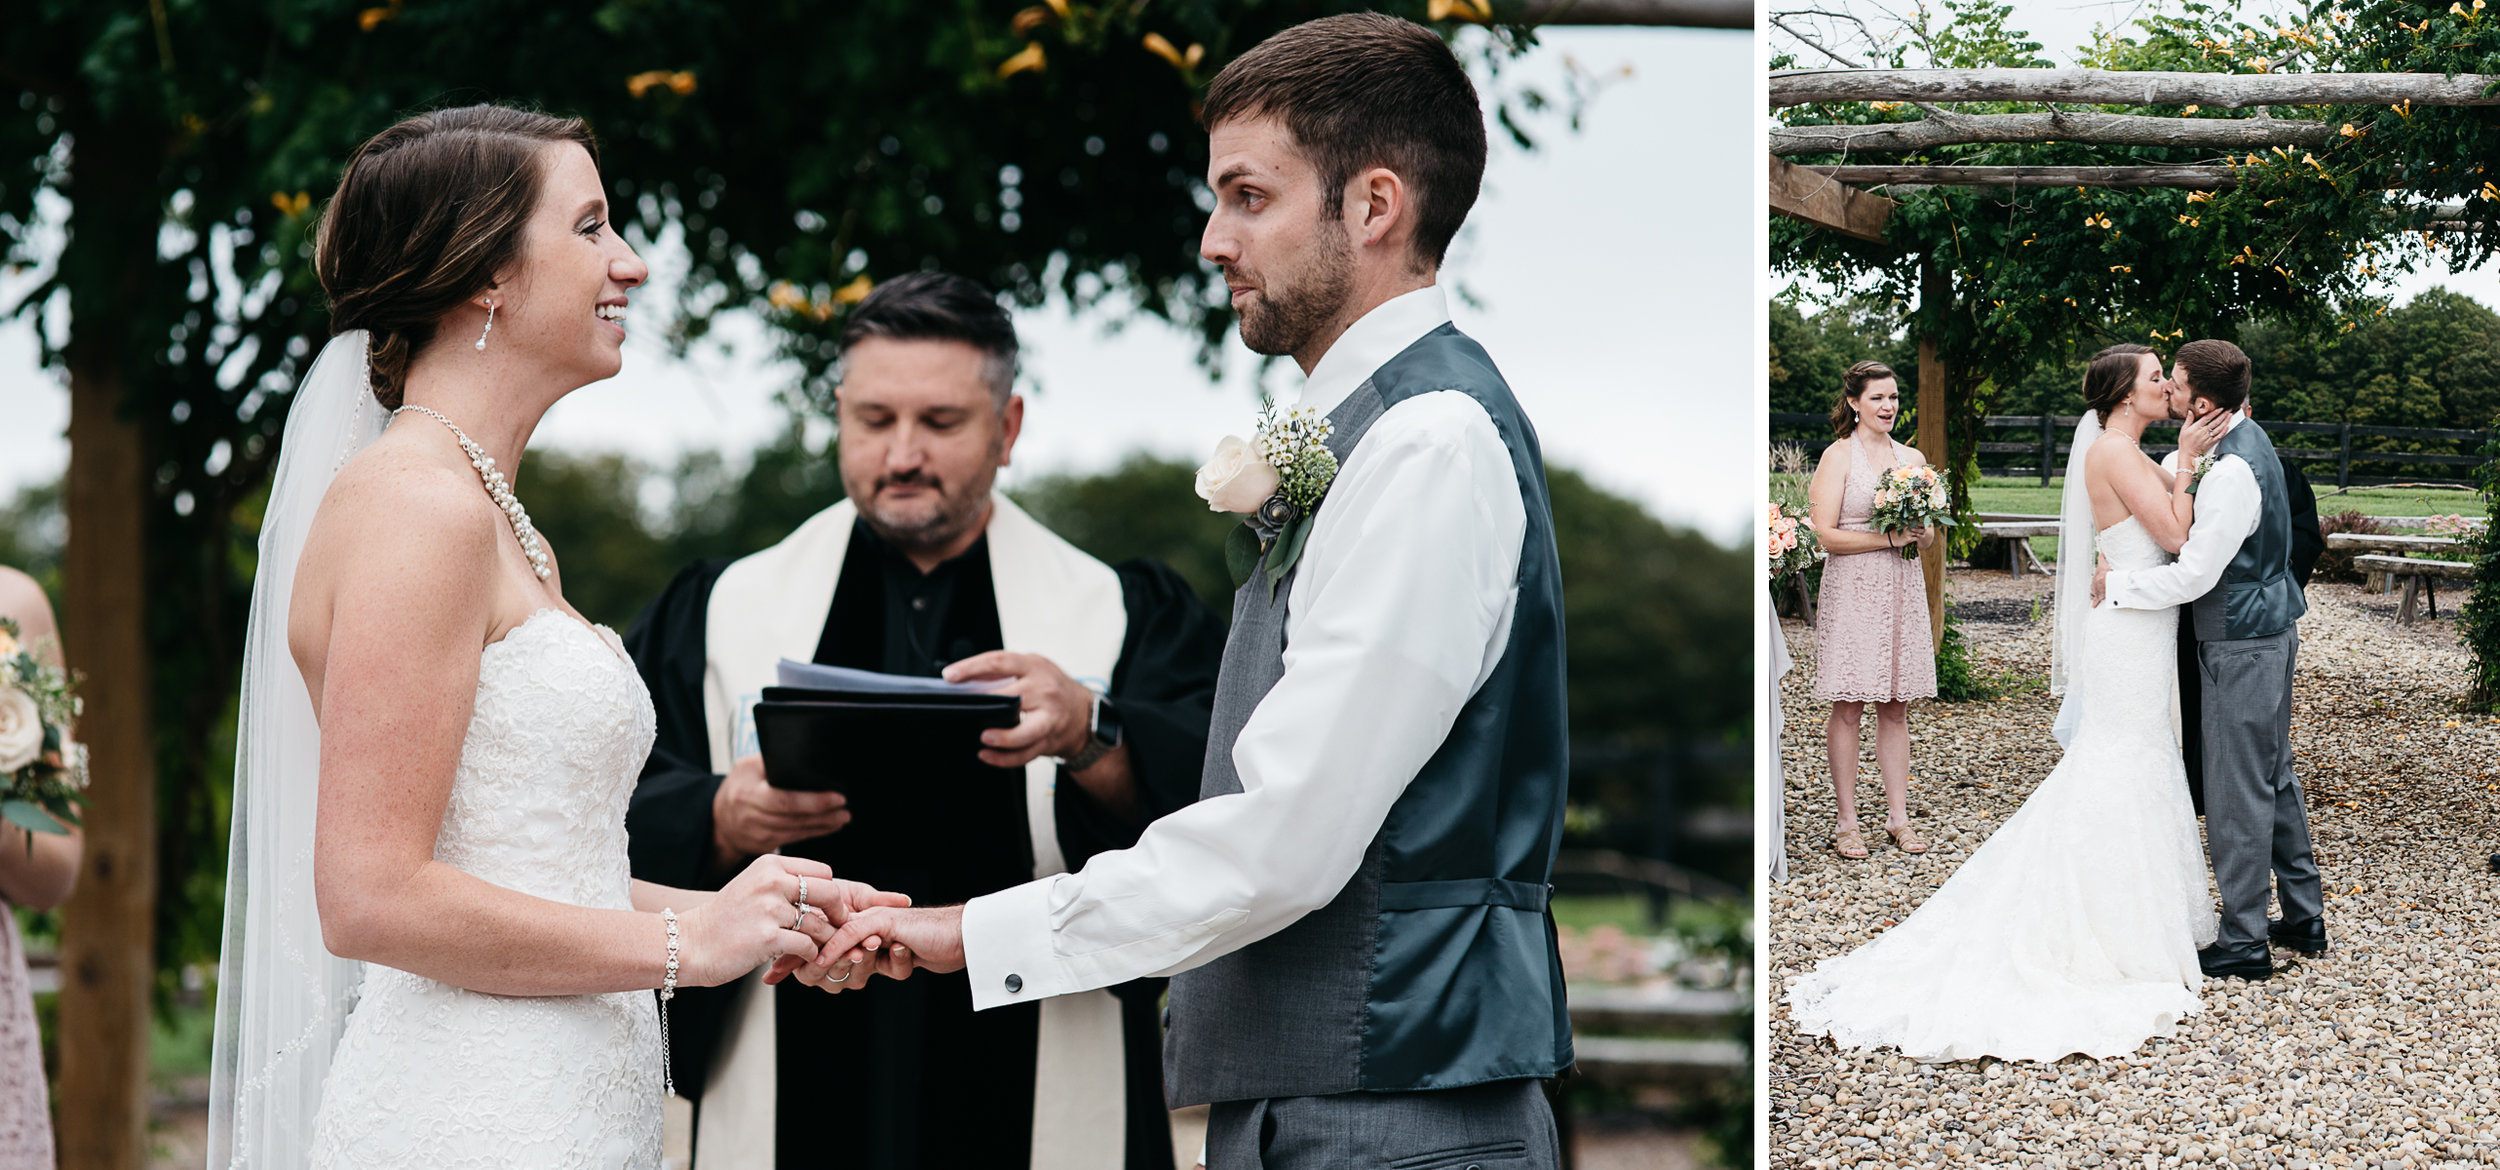 mariah fisher photography pittsburgh wedding and portrait photographer.jpg